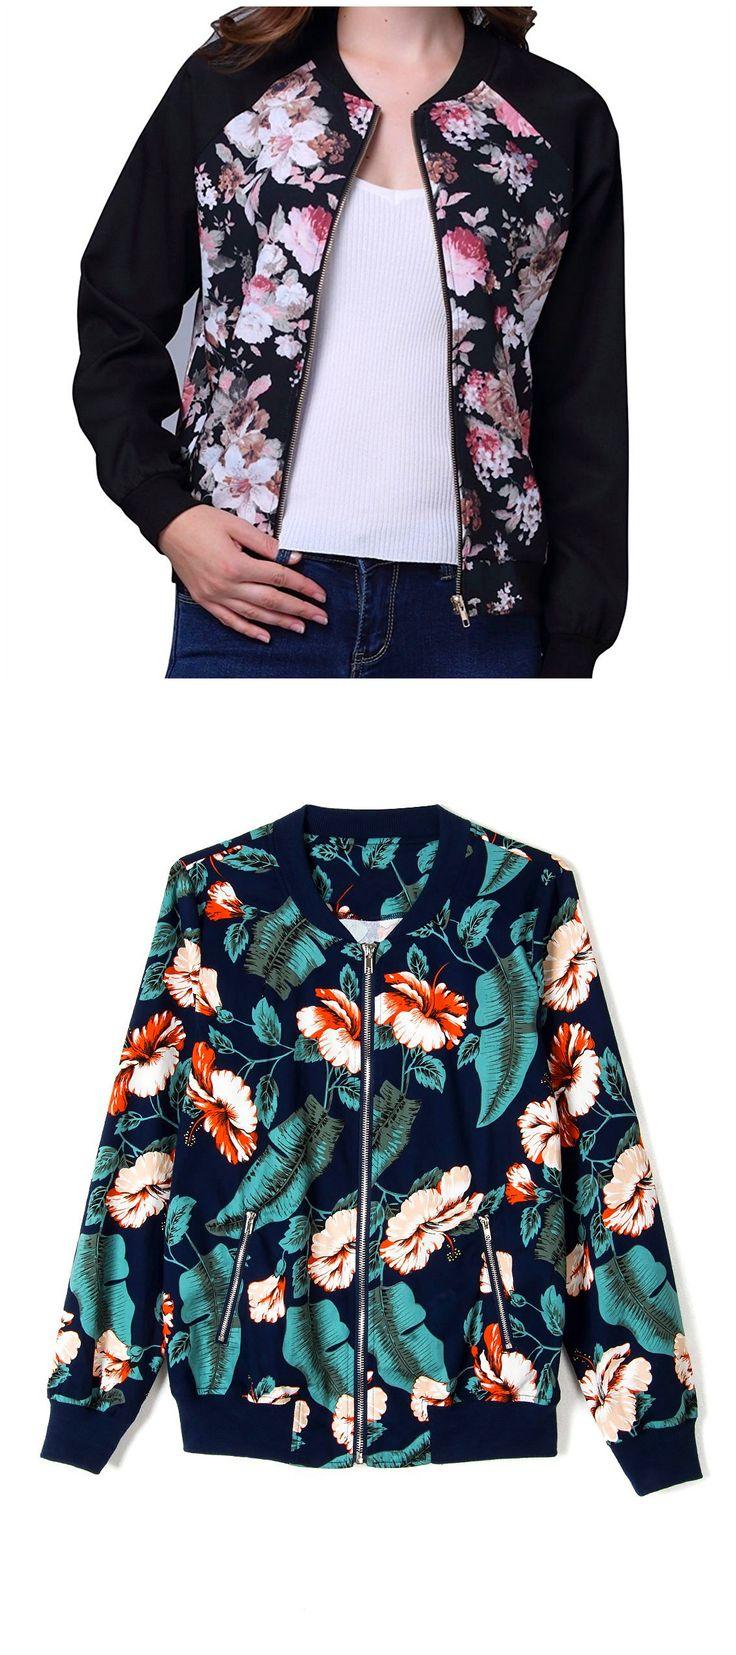 Choies Women Dark Blue Tropical Floral Print Pockted Bomber Jacket Coat Outwear